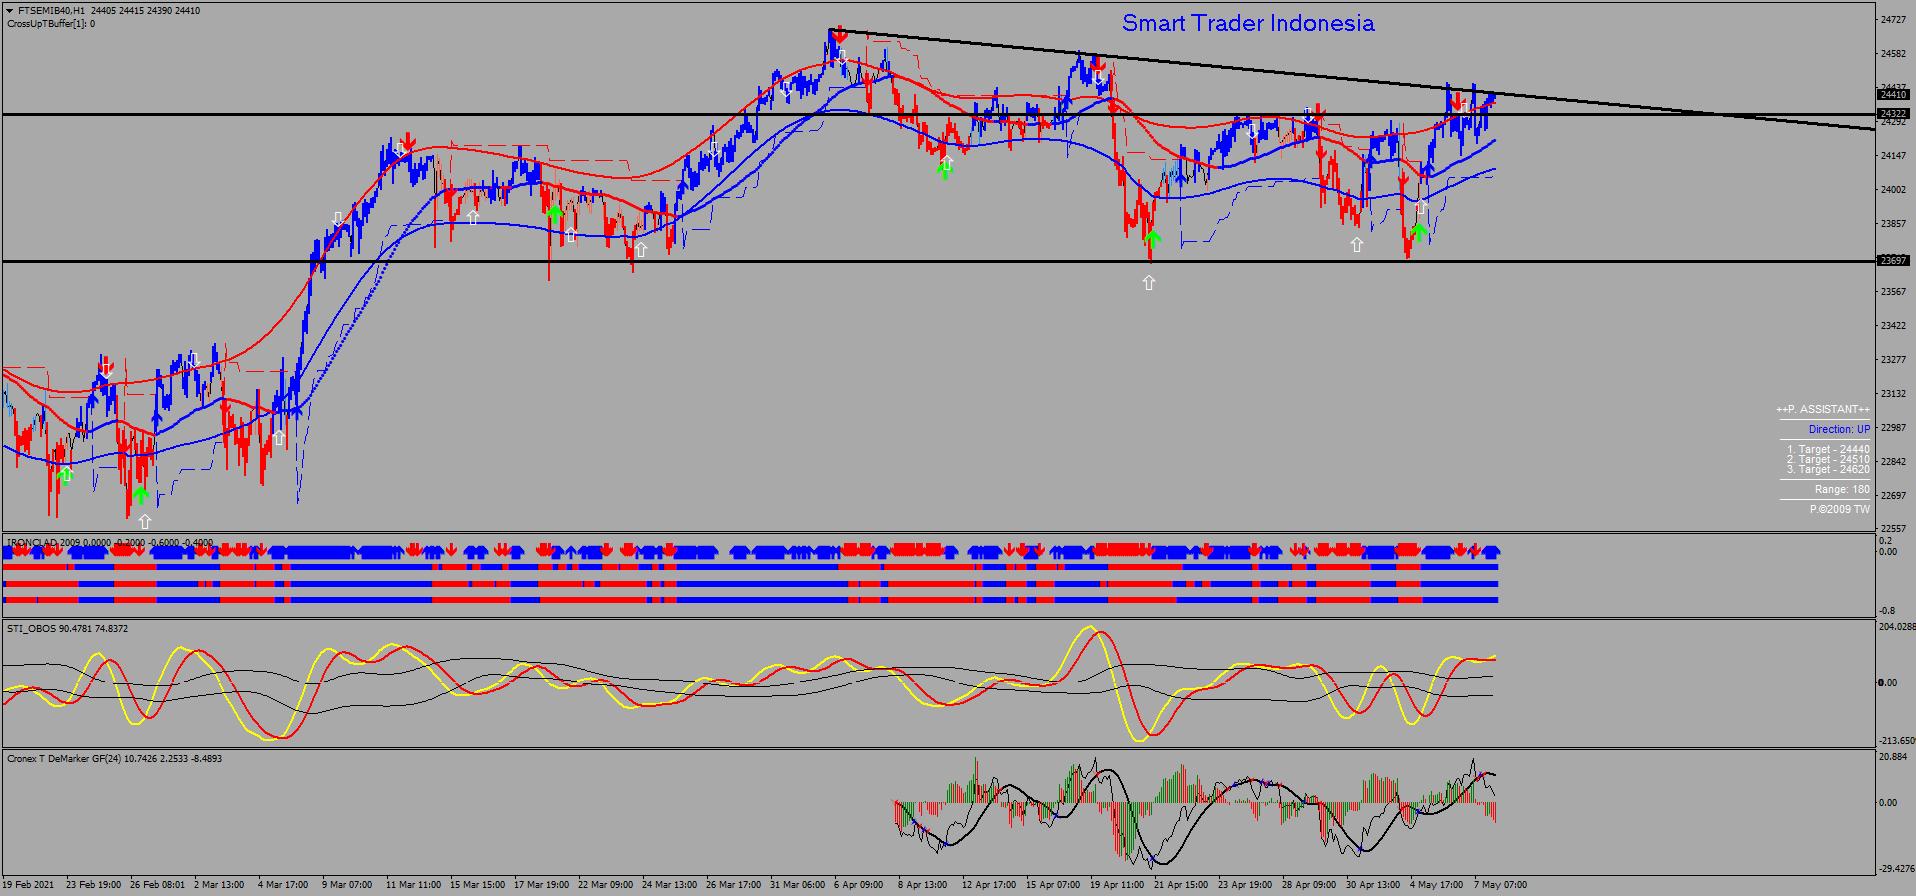 ftsemib40-h1-ava-trade-ltd-2.png